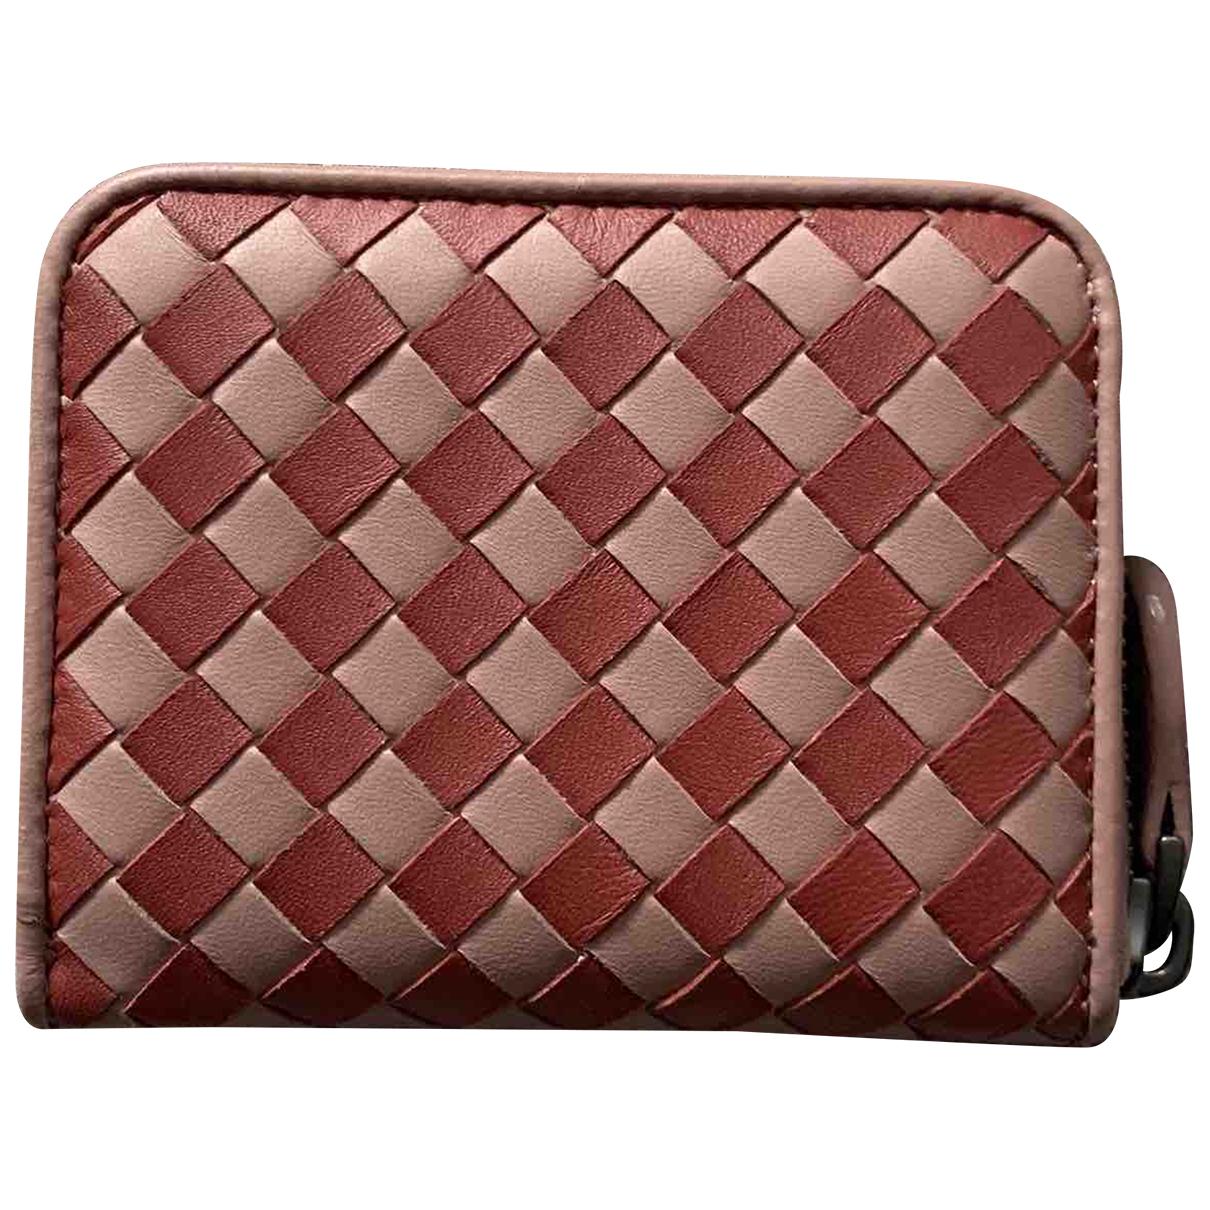 Bottega Veneta N Pink Leather Purses, wallet & cases for Women N